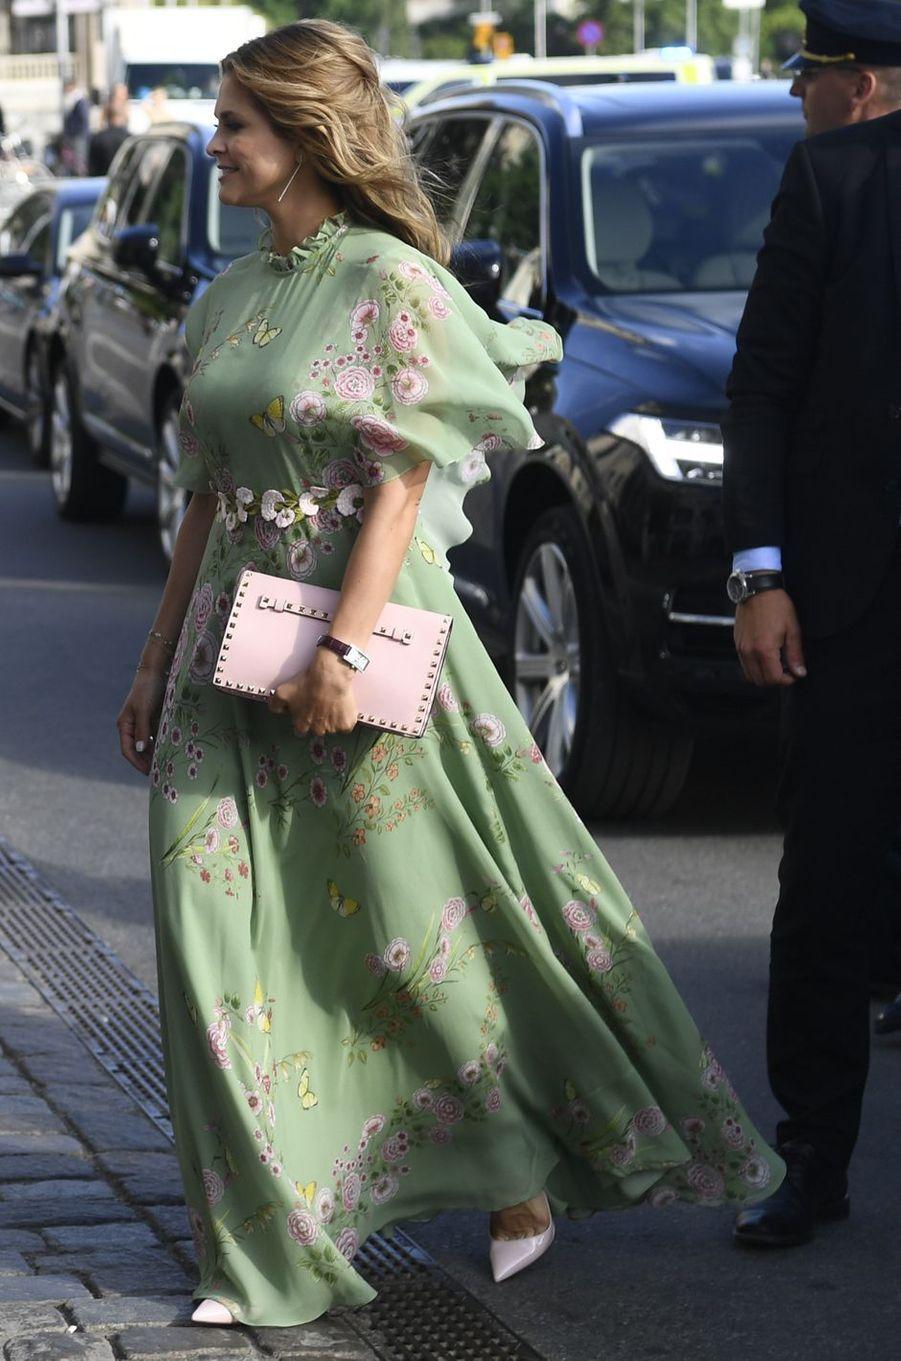 La princesse Madeleine de Suède dans une robe Giambattista Valli, le 14 juin 2018